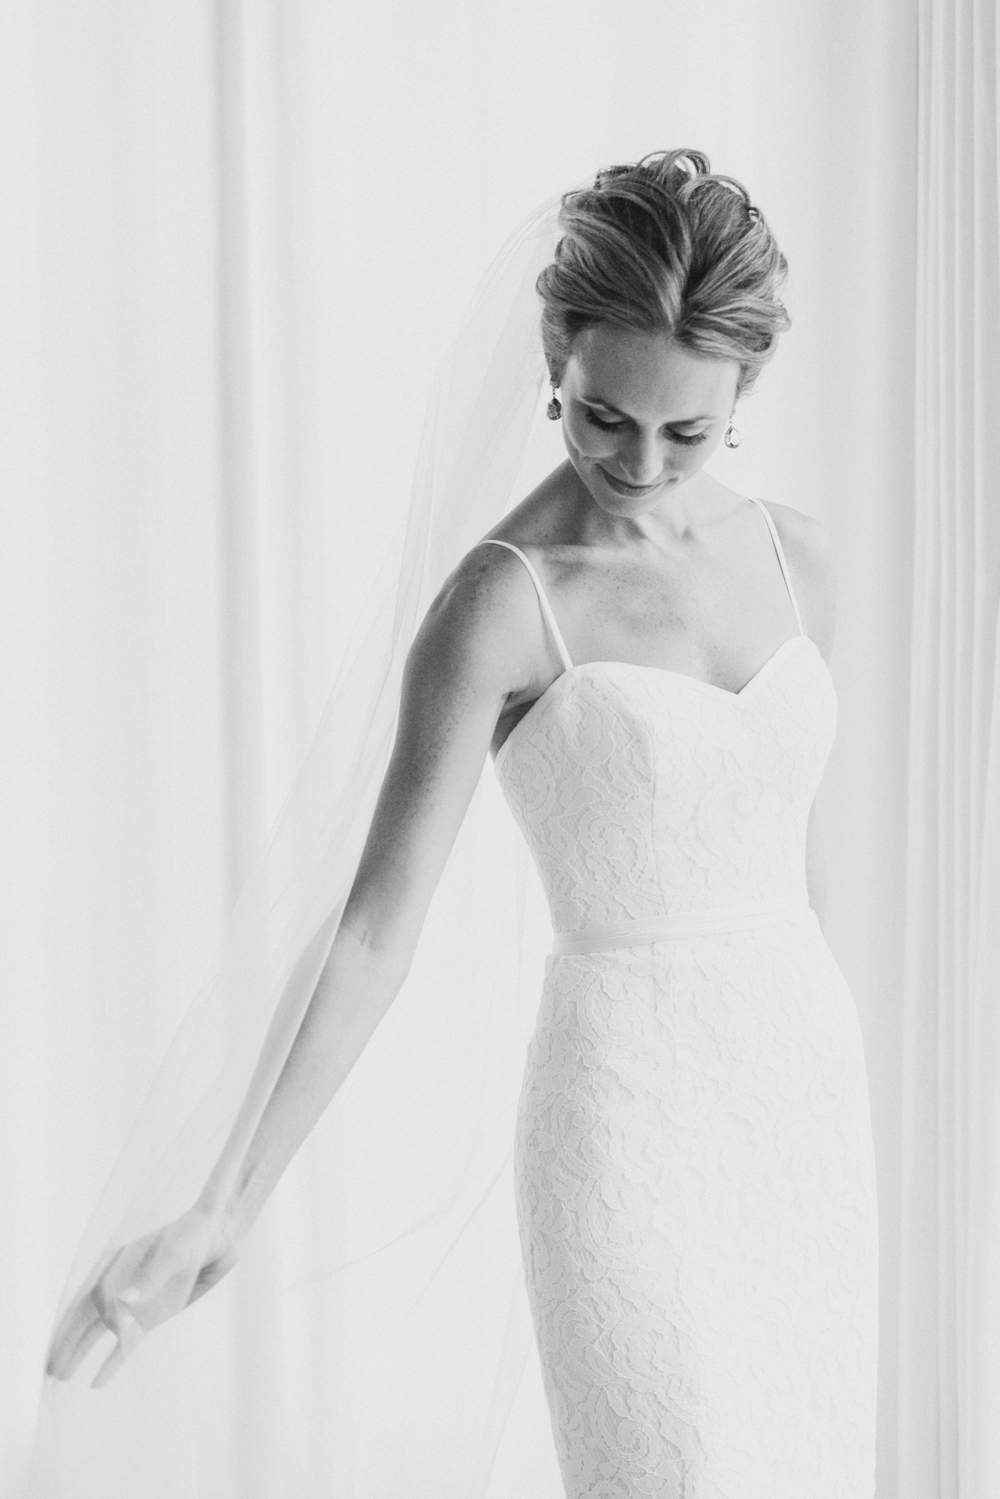 St_Joan_of_Arc_Indianapolis_Sahms_Atrium_Indiana_Wedding_Photography_Chloe_Luka_Photography_6565.jpg